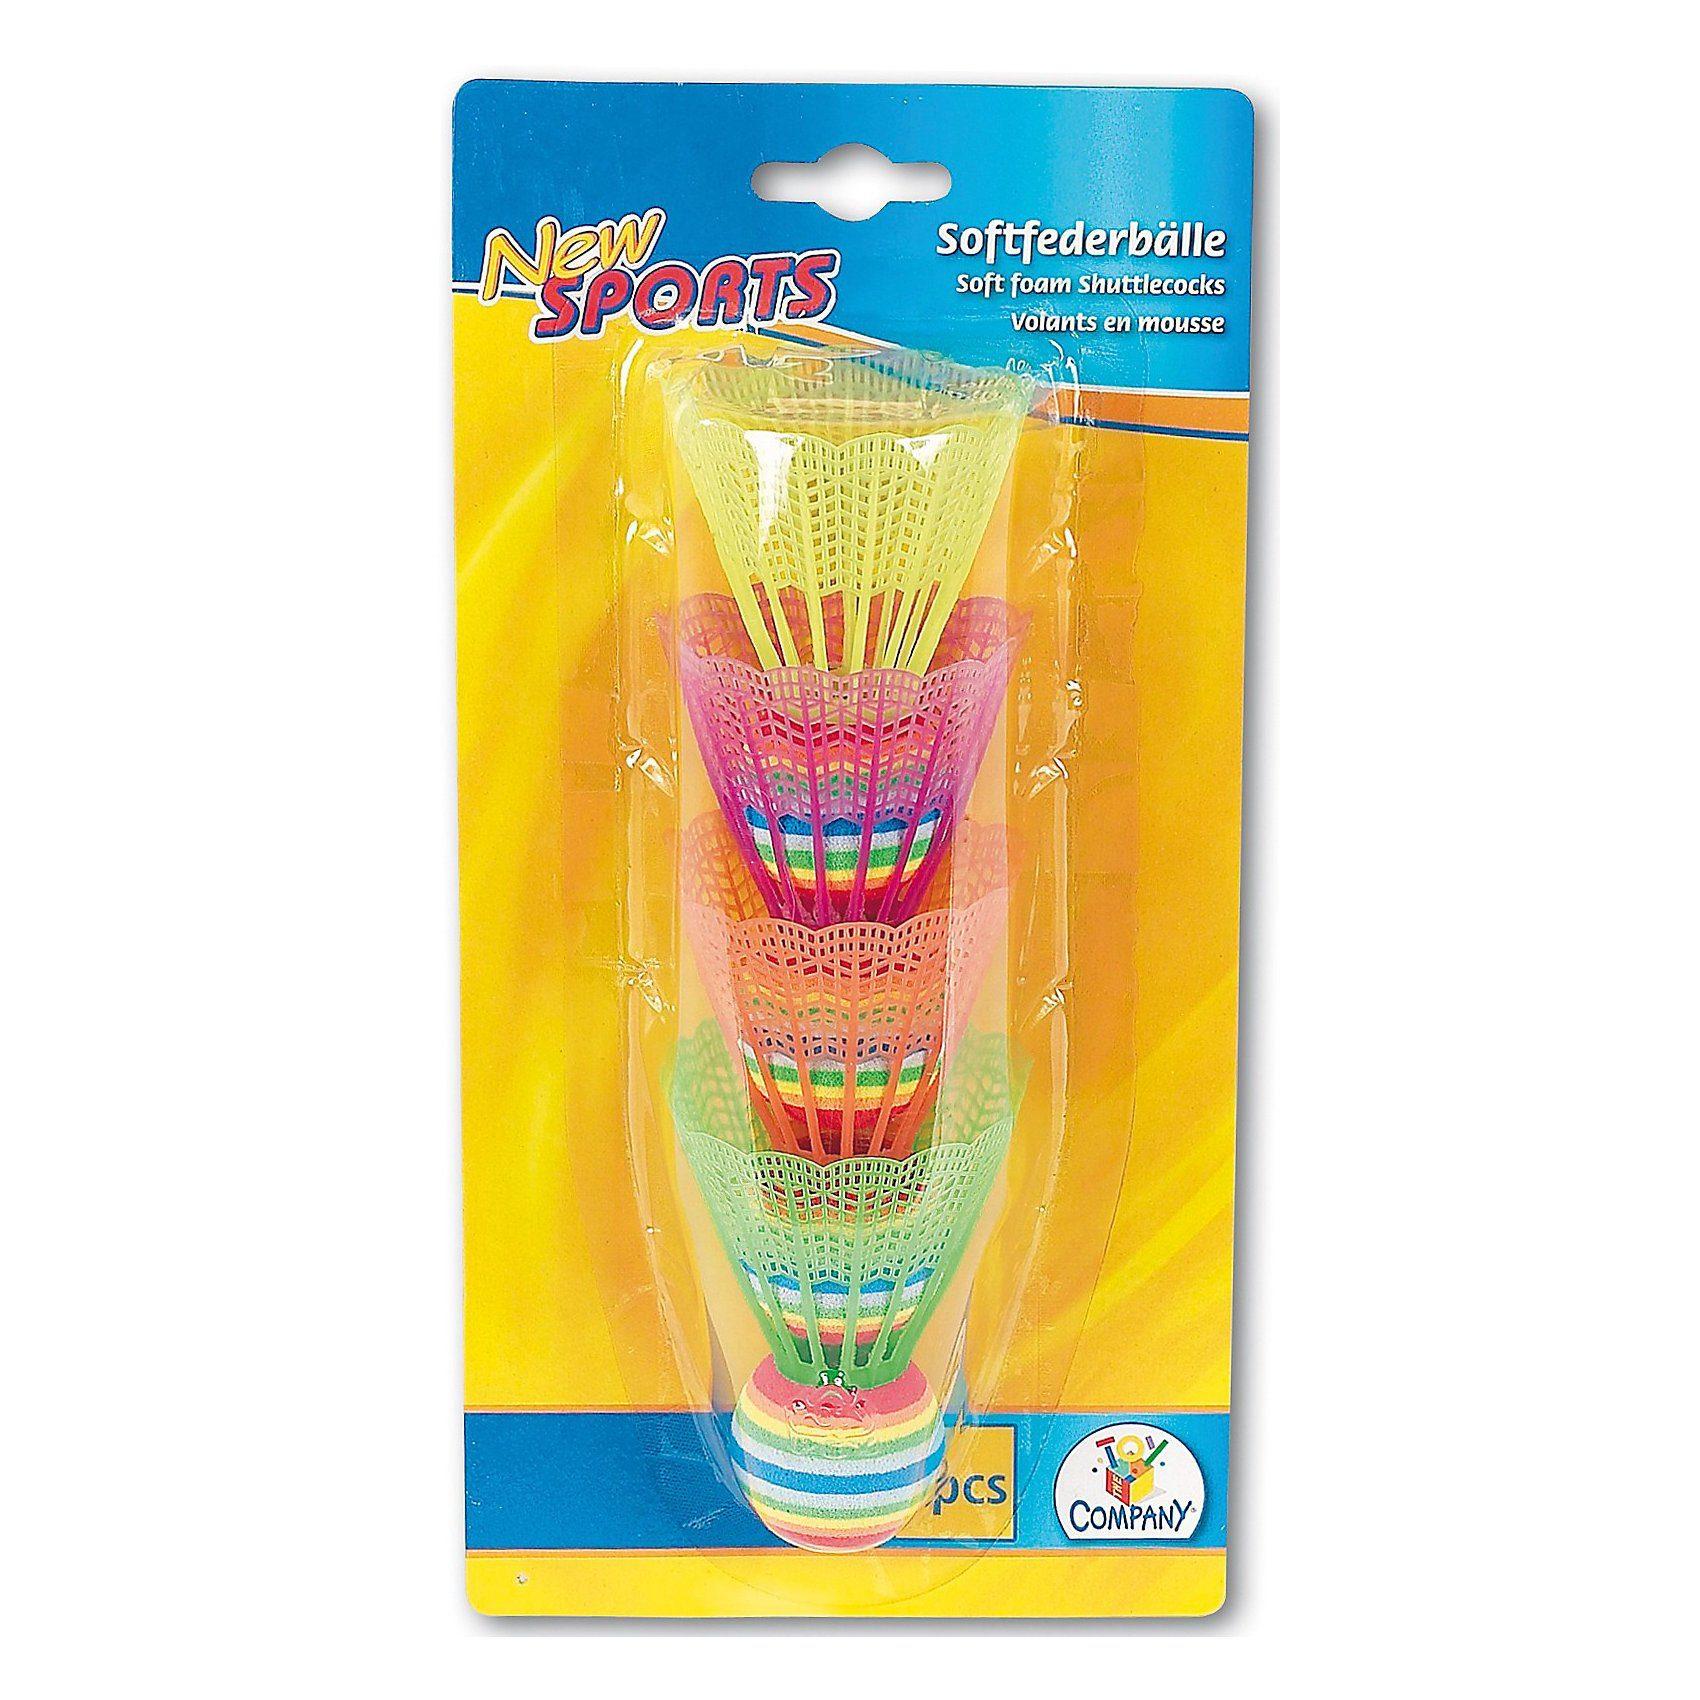 New Sports Softfederbälle, vier Stück